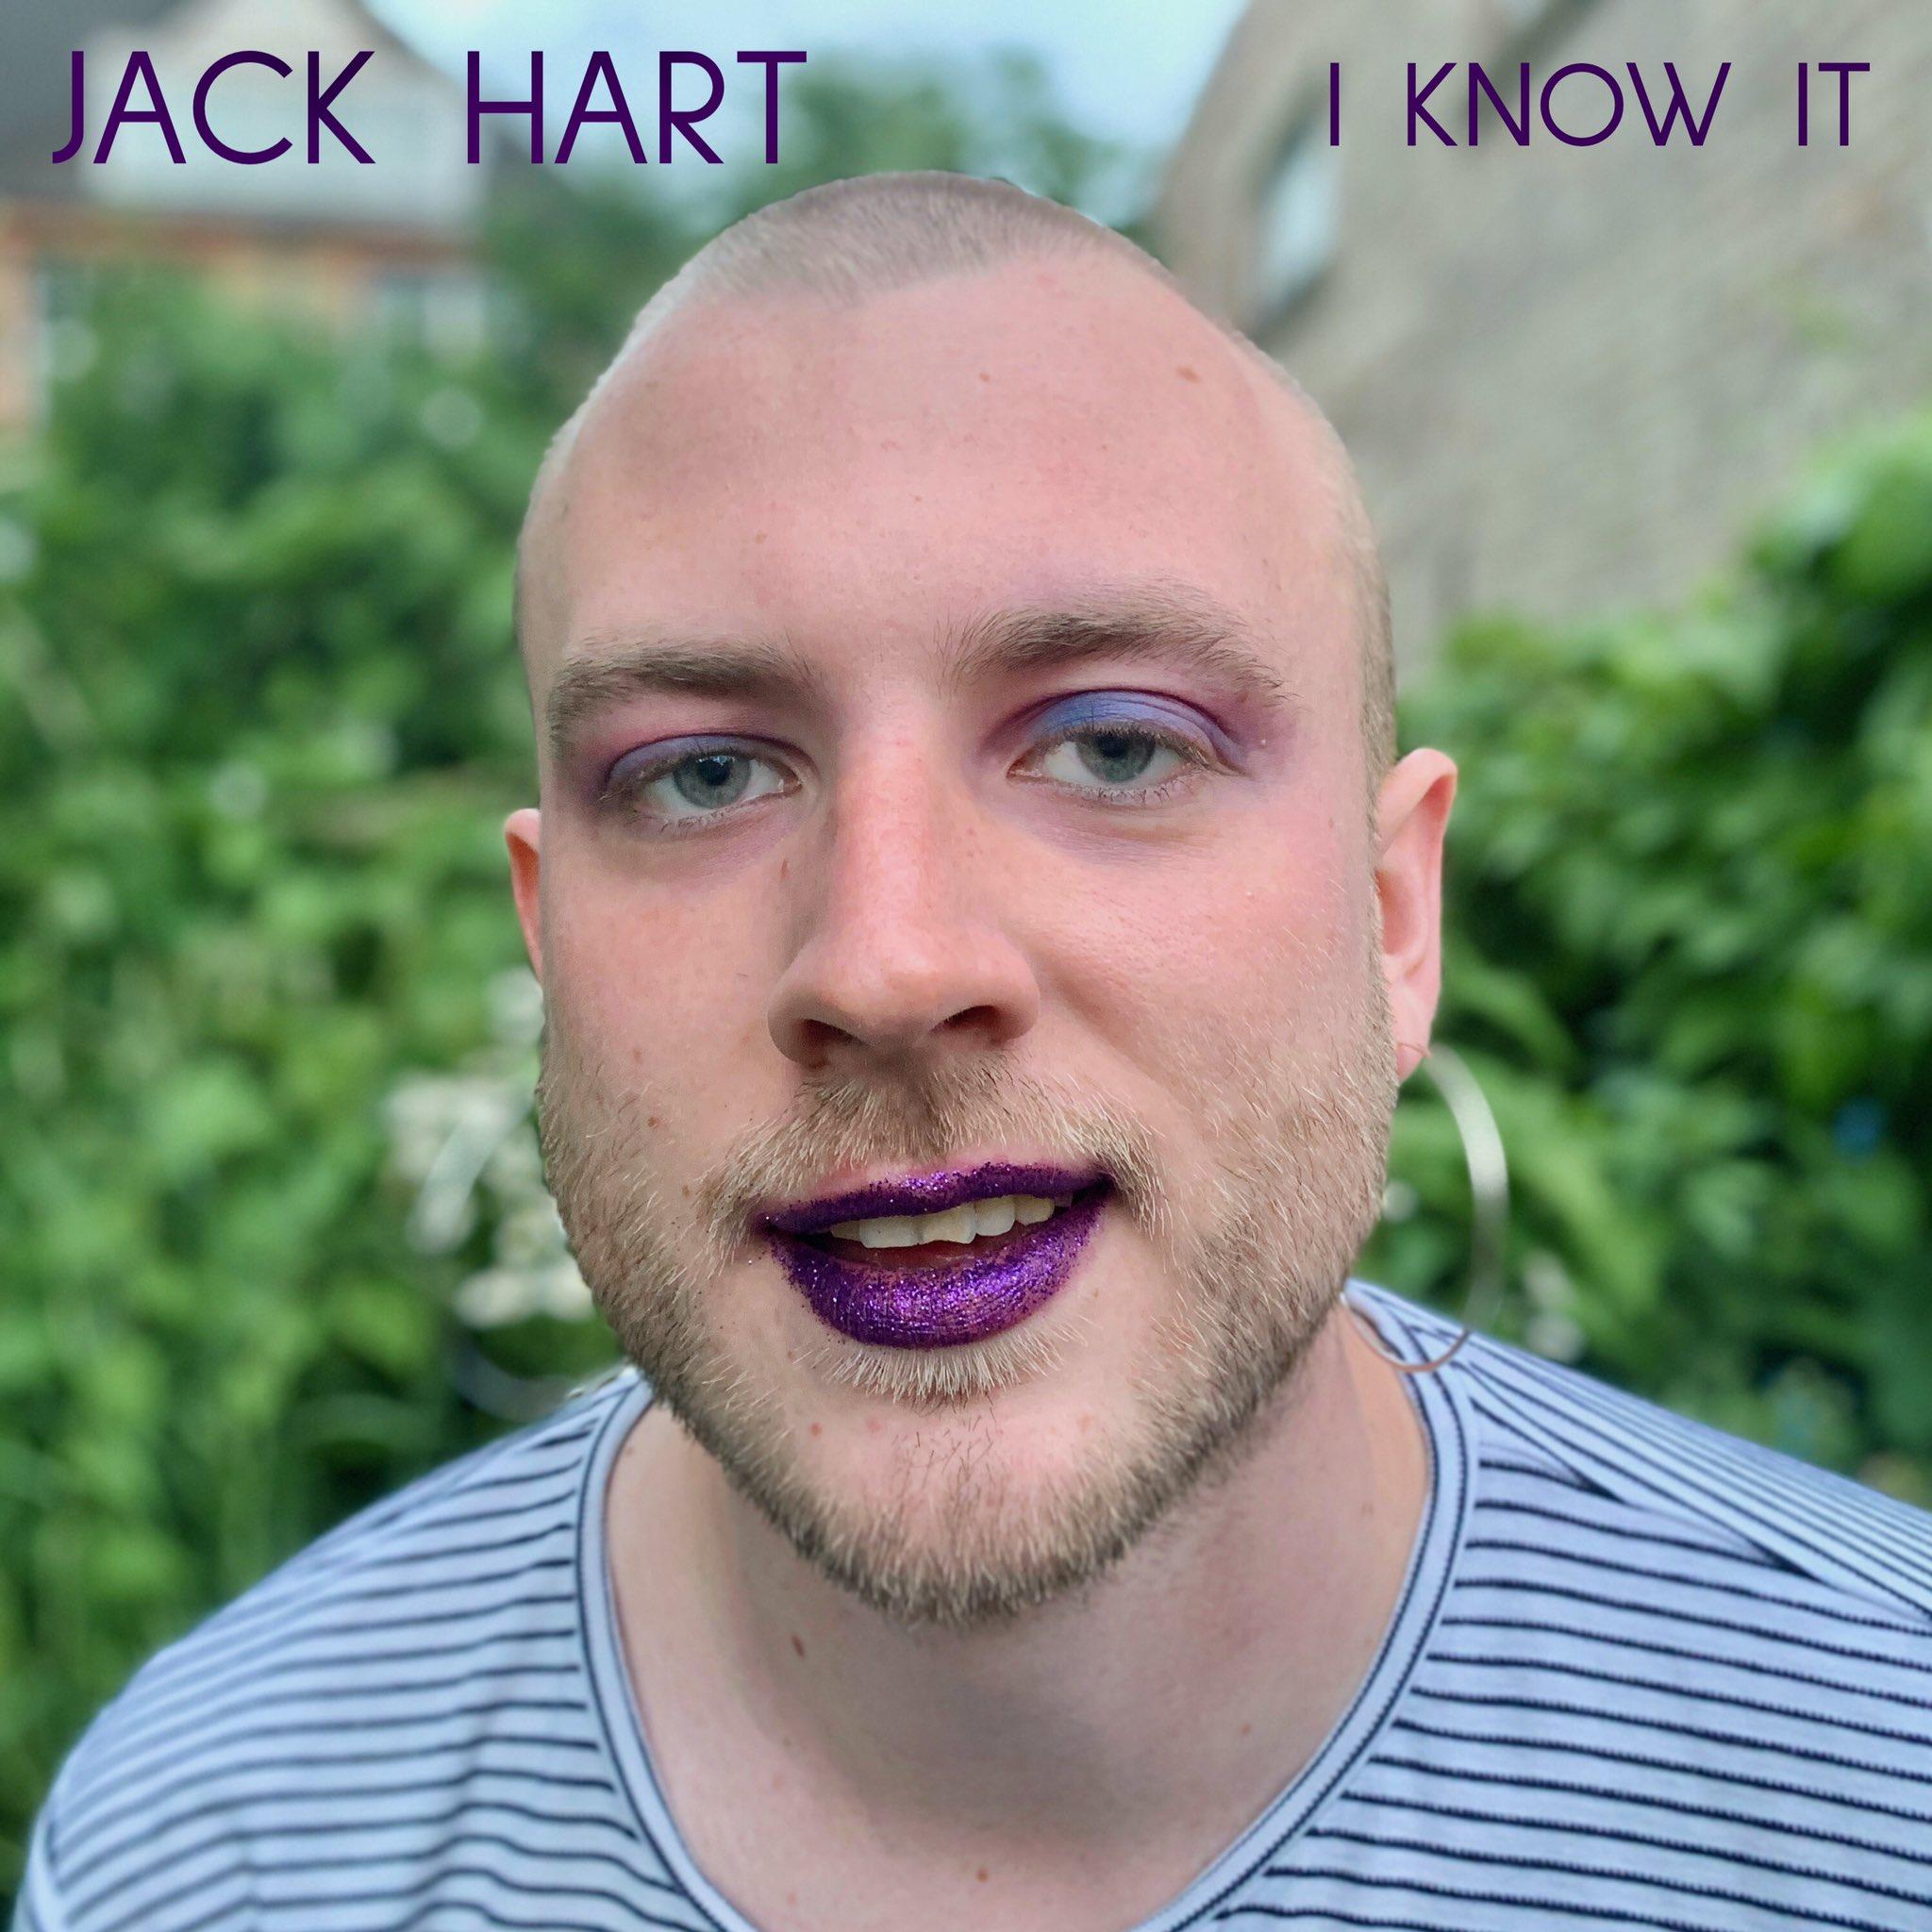 Jack's New Single